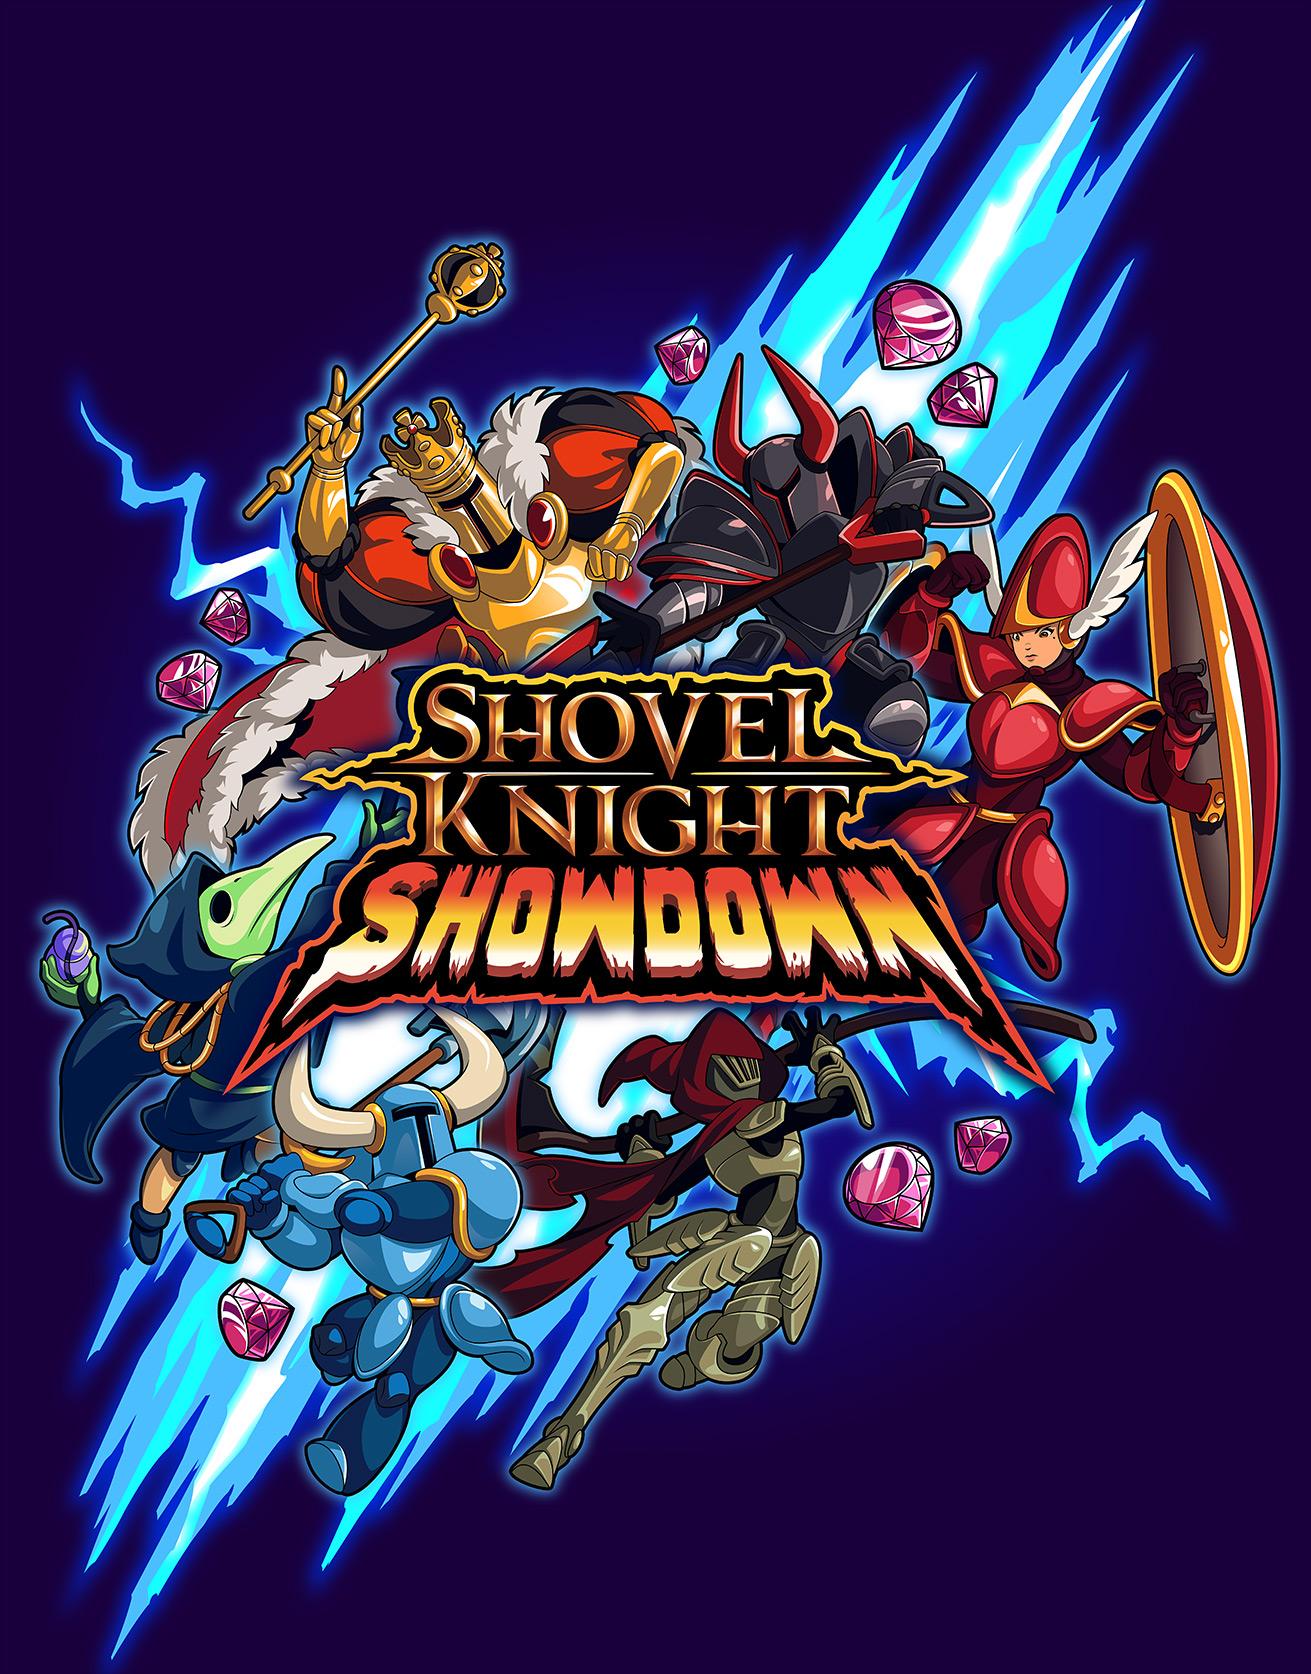 Final Shovel Knight Dlc Pits Player Against Player Mxdwn Games